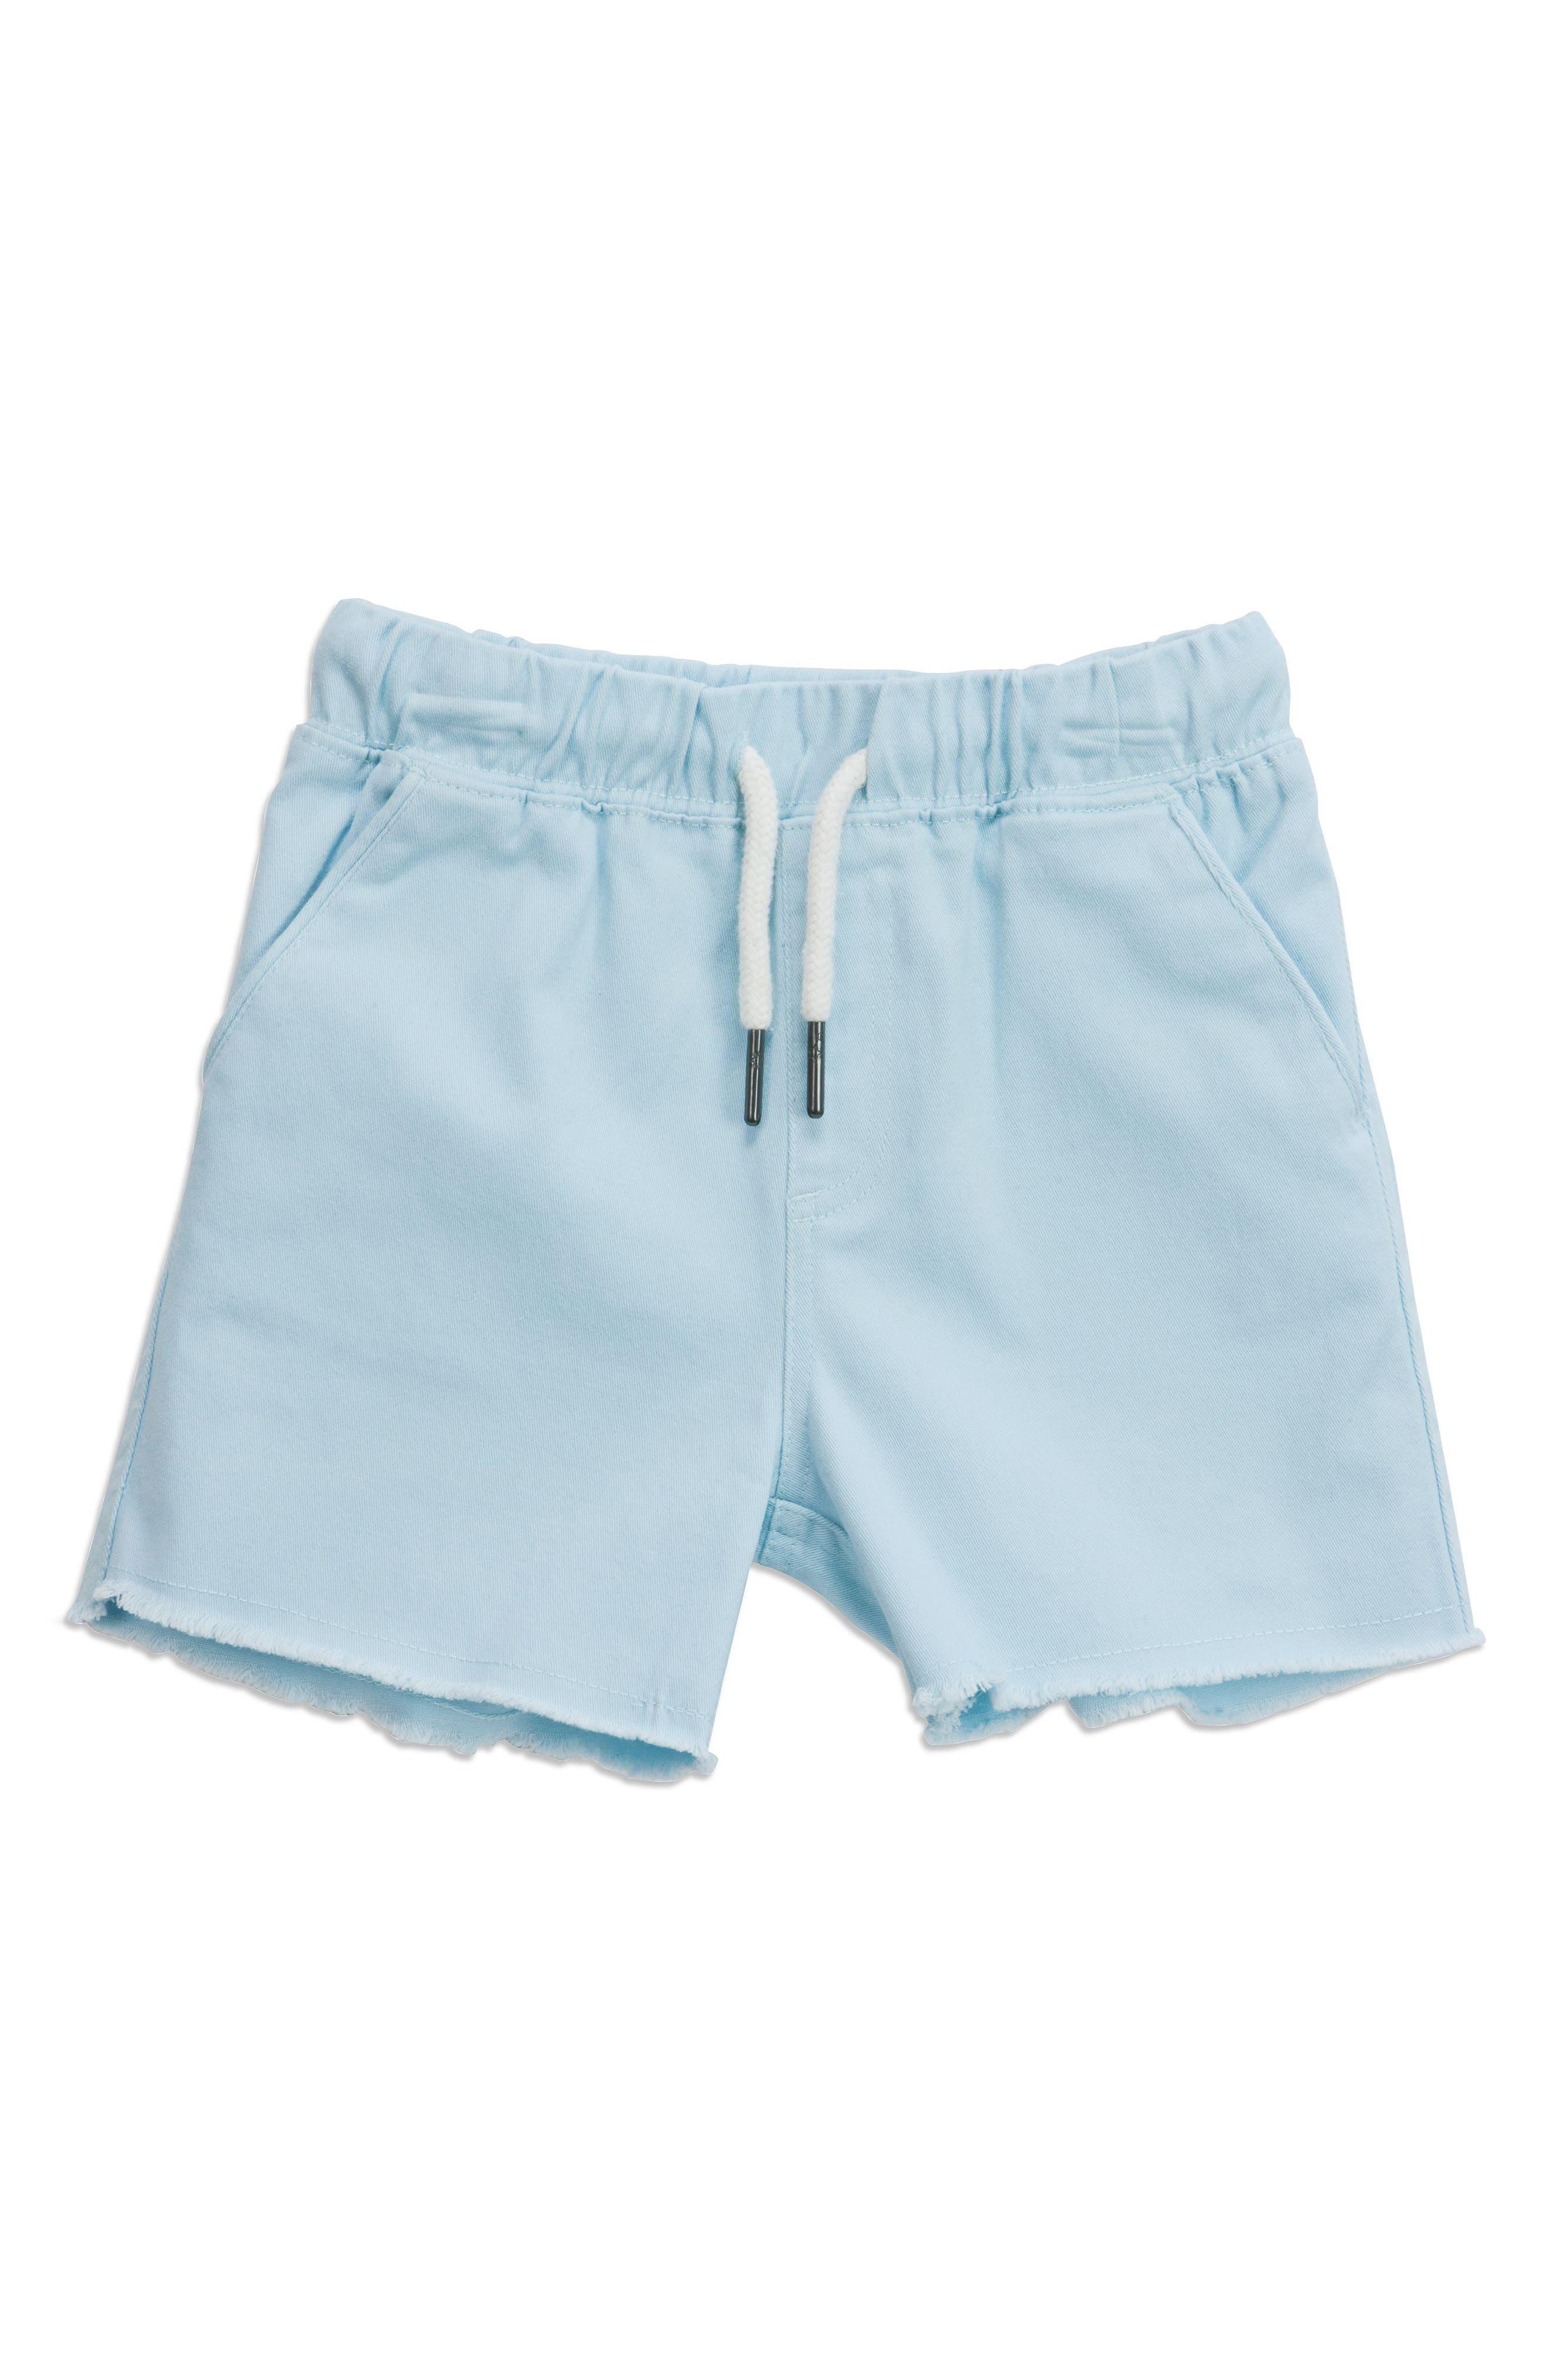 Alaska Shorts,                             Main thumbnail 1, color,                             Light Blue